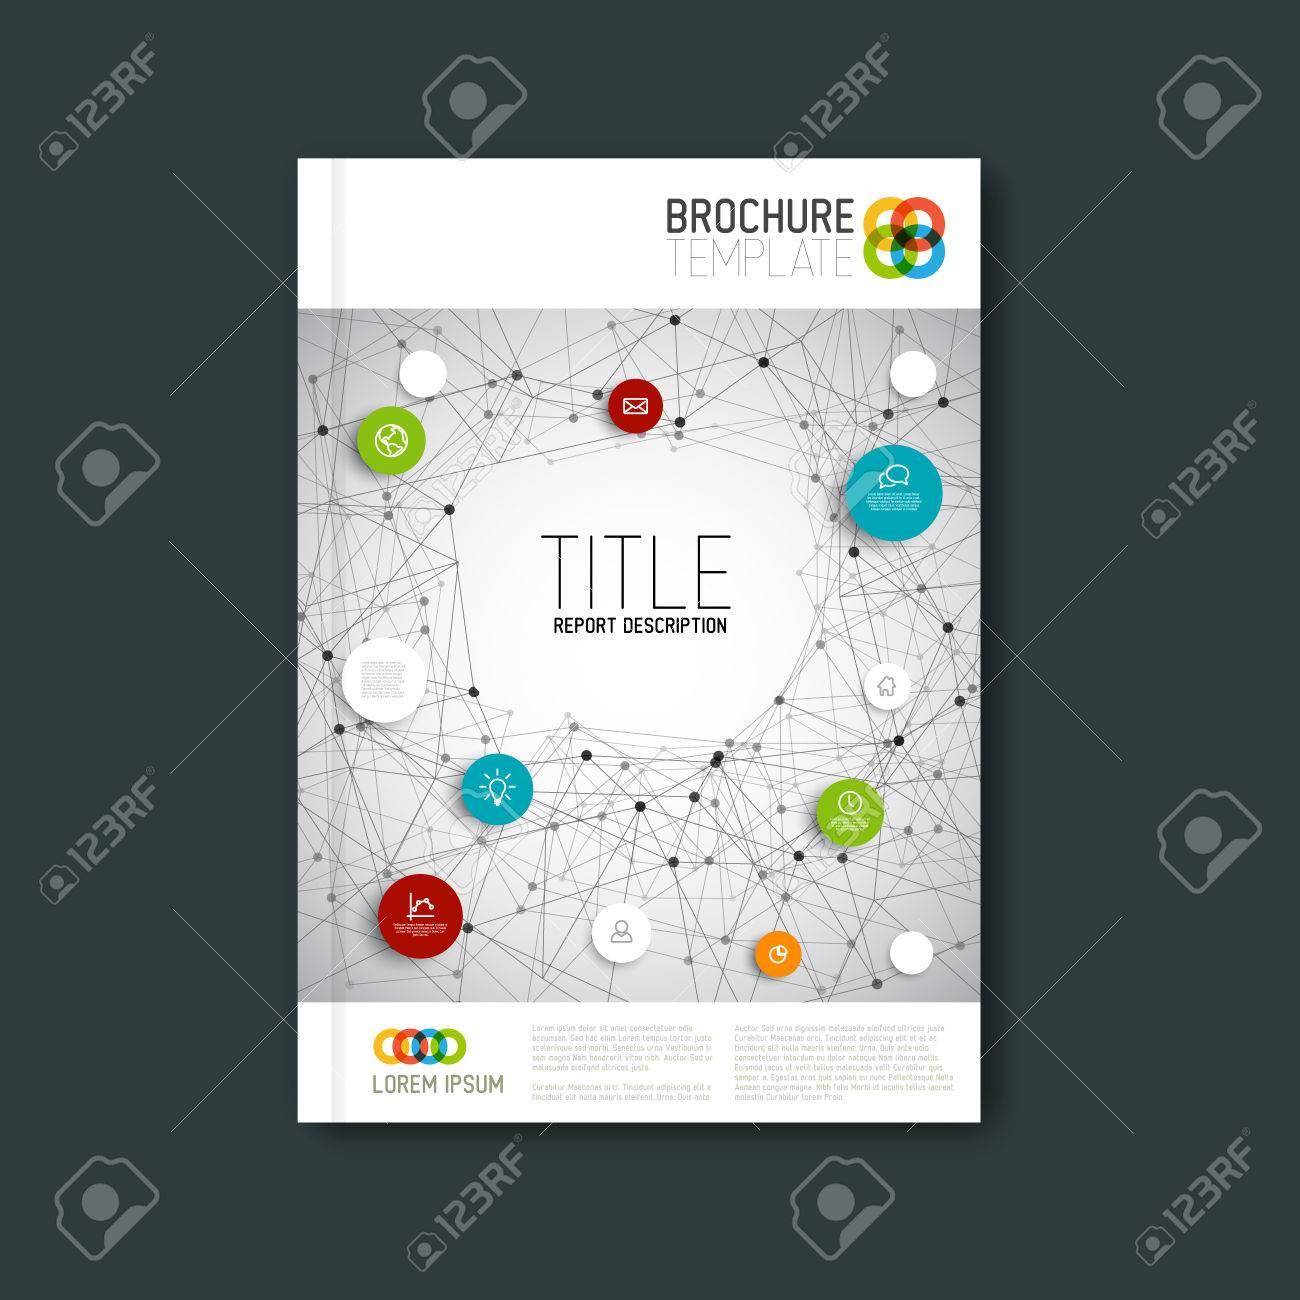 Modern Vector abstract brochure, report or flyer design template - 41955986